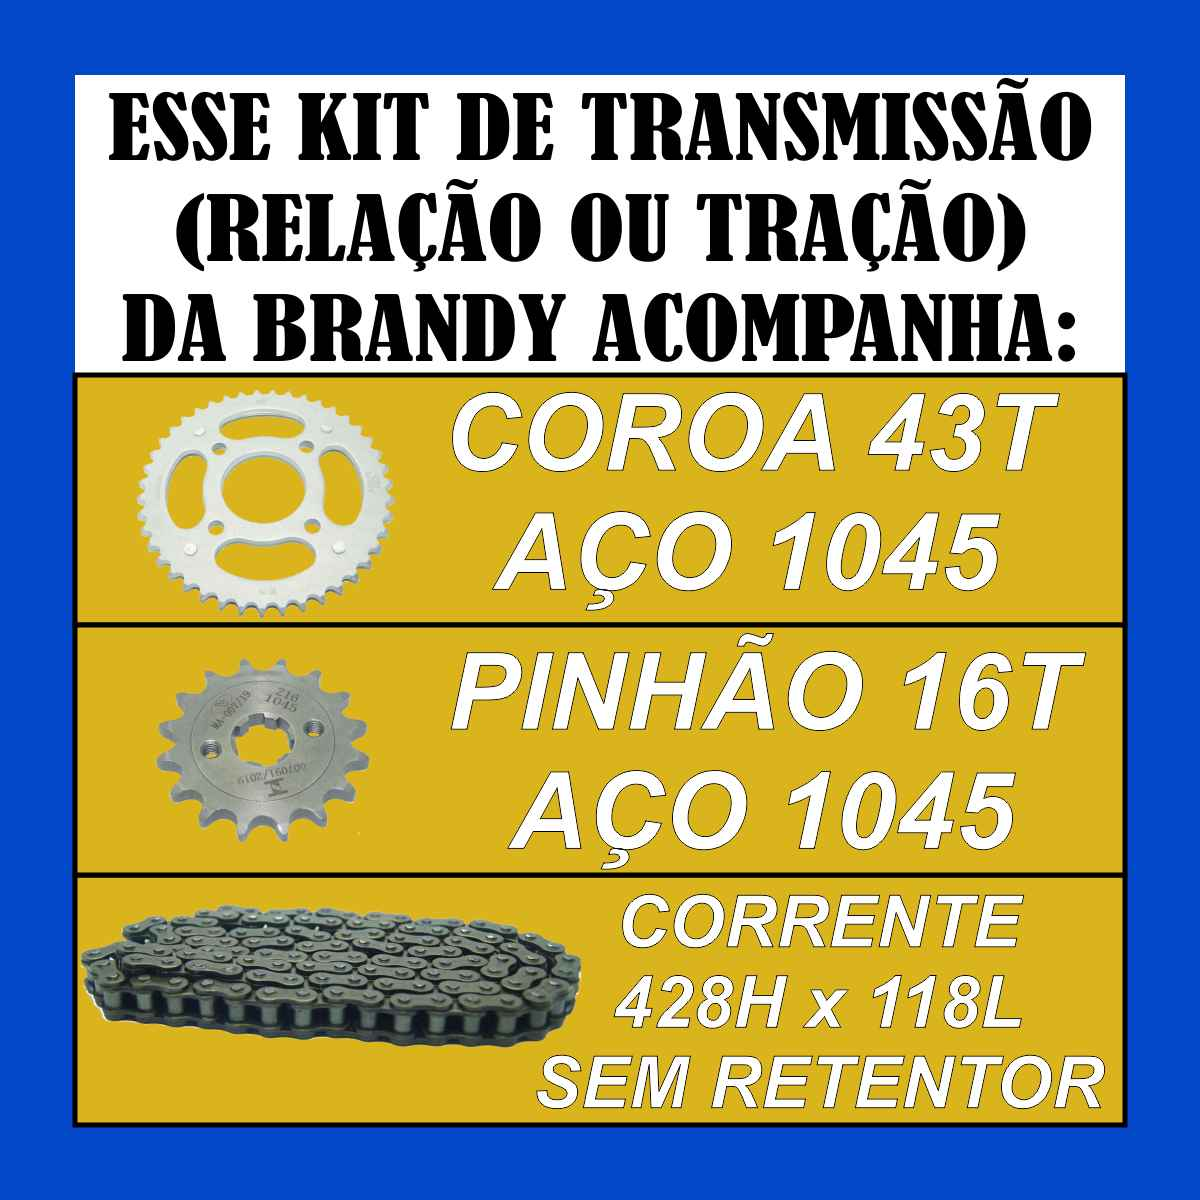 KIT TRANSMISSAO RELAÇÃO BRANDY CORRENTE 428H x 118L COROA 43T PINHÃO 16T PARA MOTO CG FAN TITAN 150